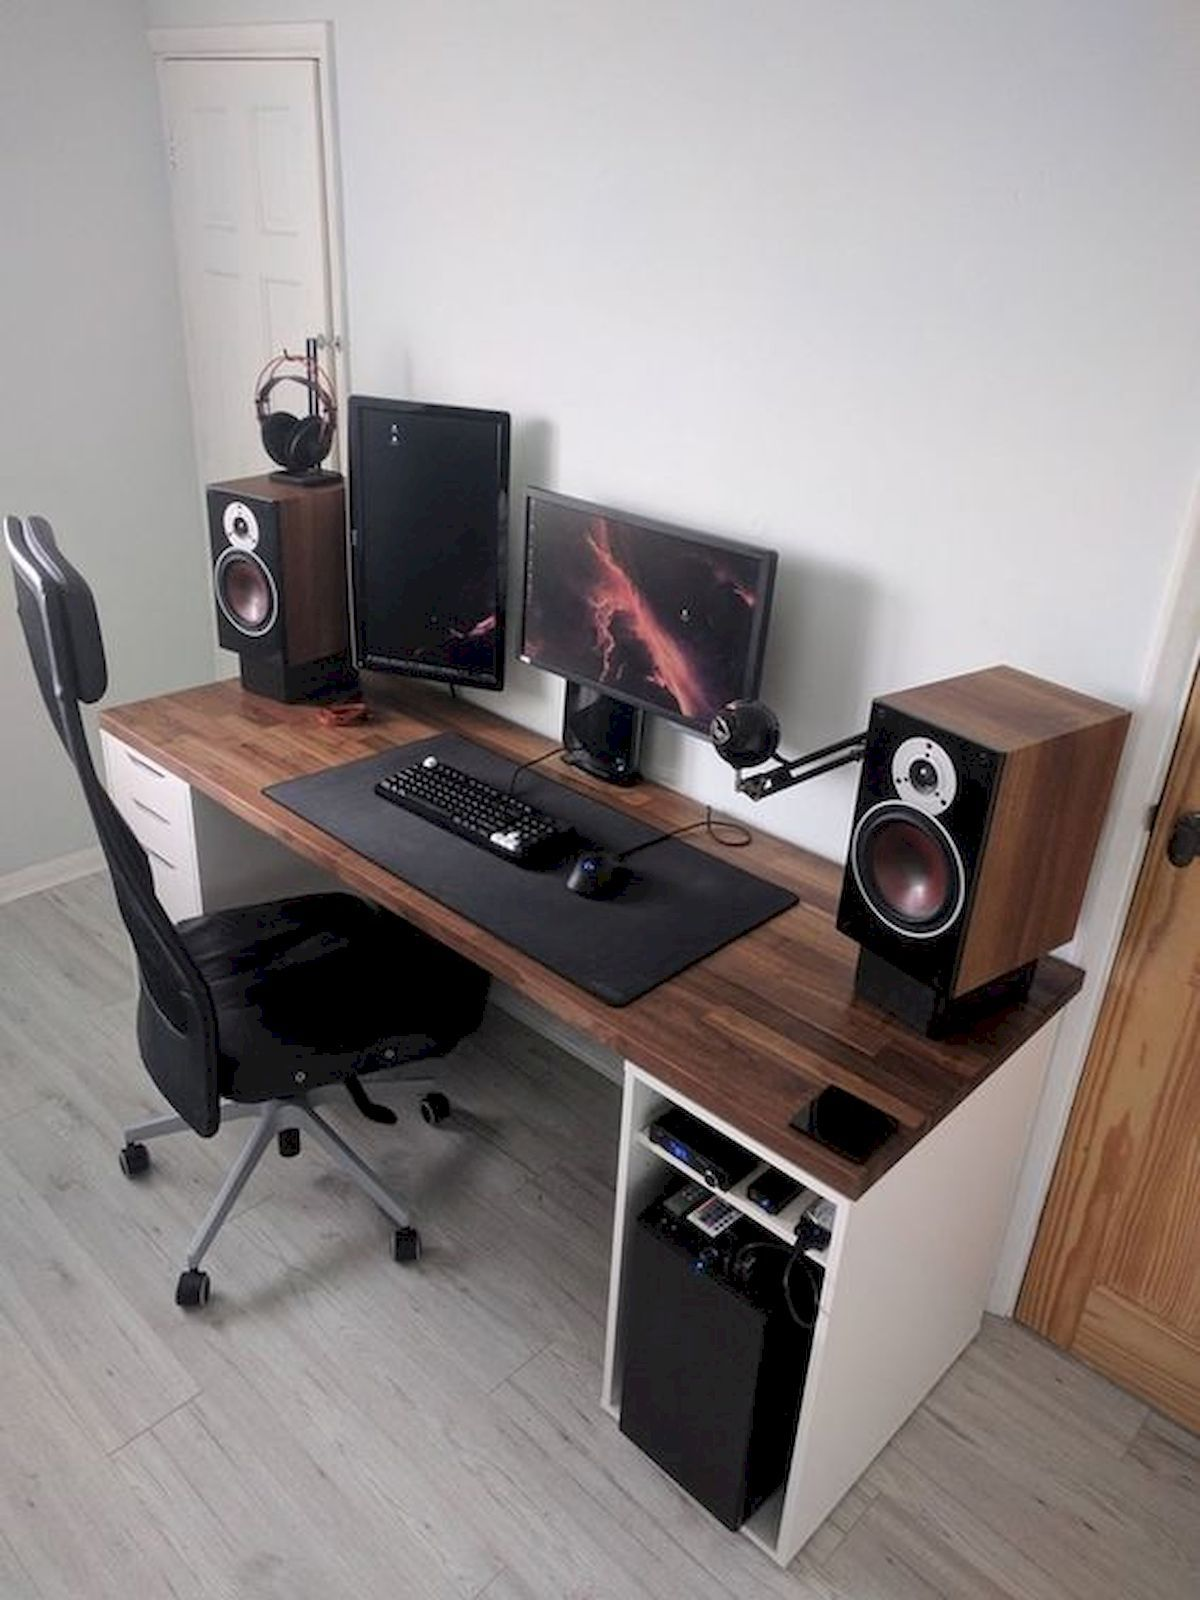 50 Favorite Diy Computer Desk Design Ideas And Decor Kantor